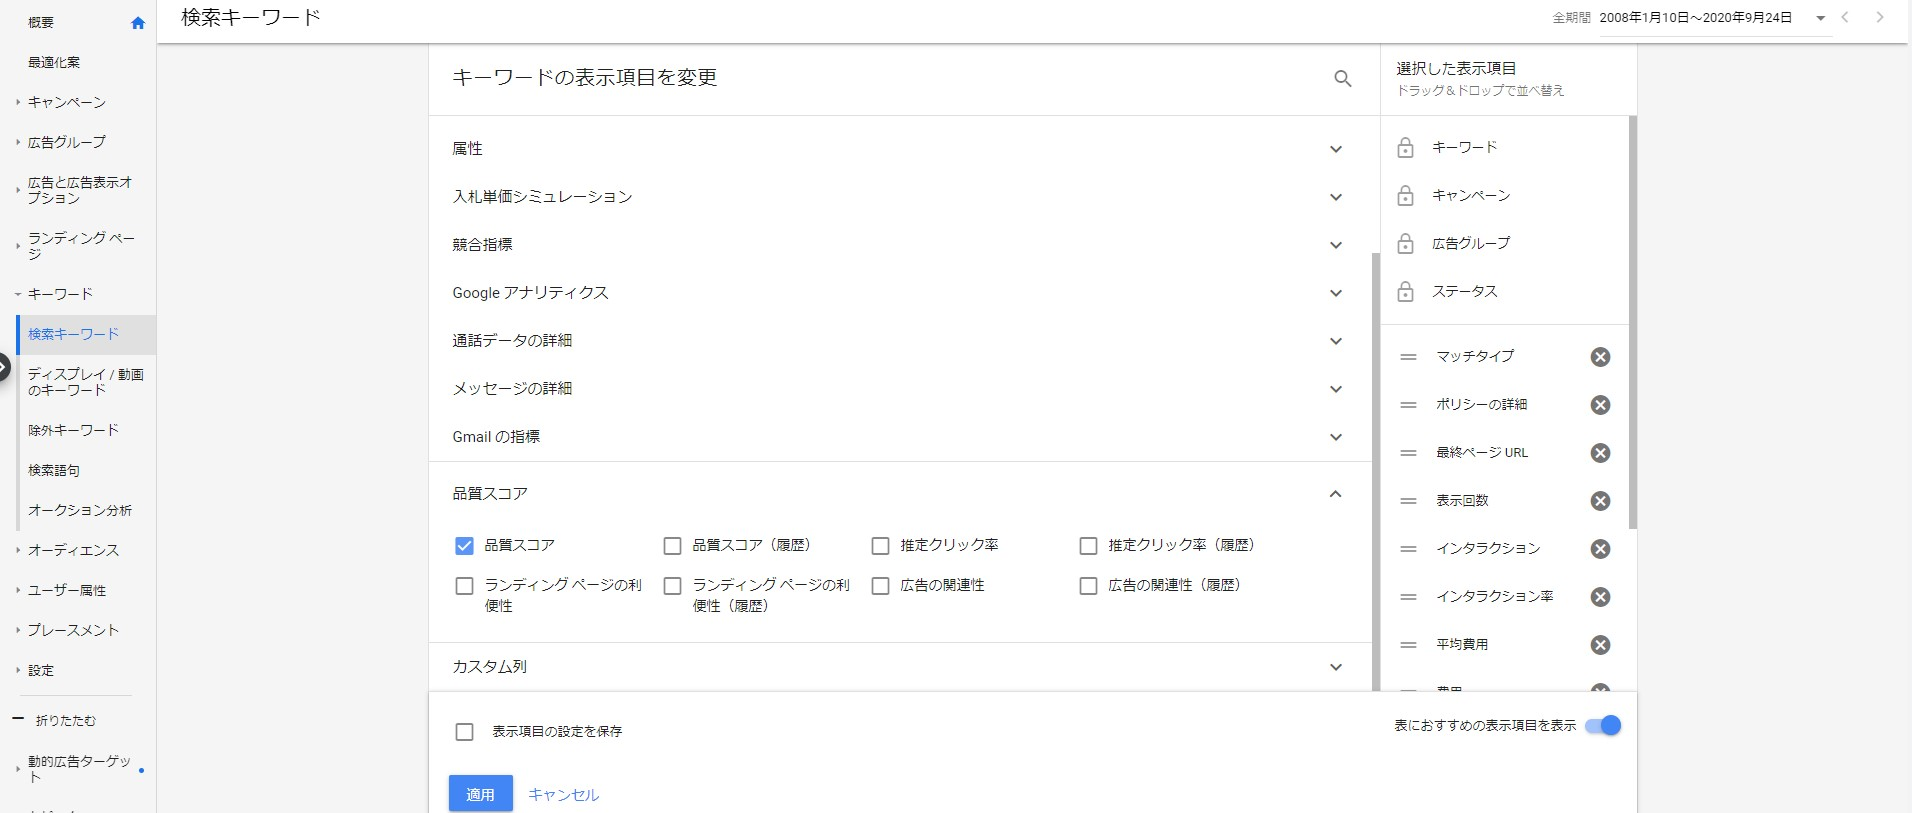 Google広告の表示項目選画面